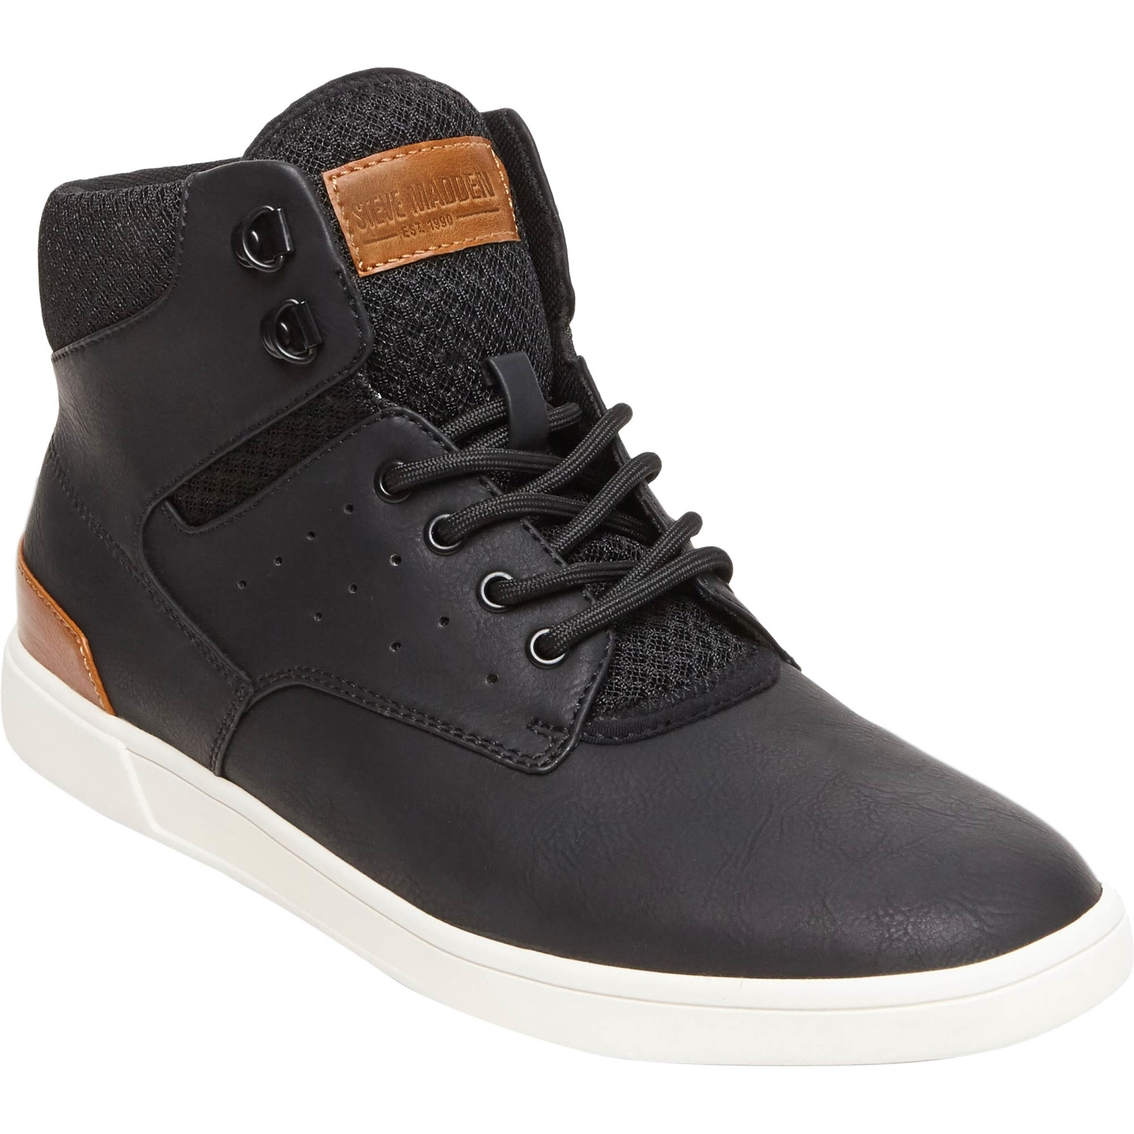 7f8de6218c3 Steve Madden Men's Fridged Black Shoes | Casuals | Back To School ...